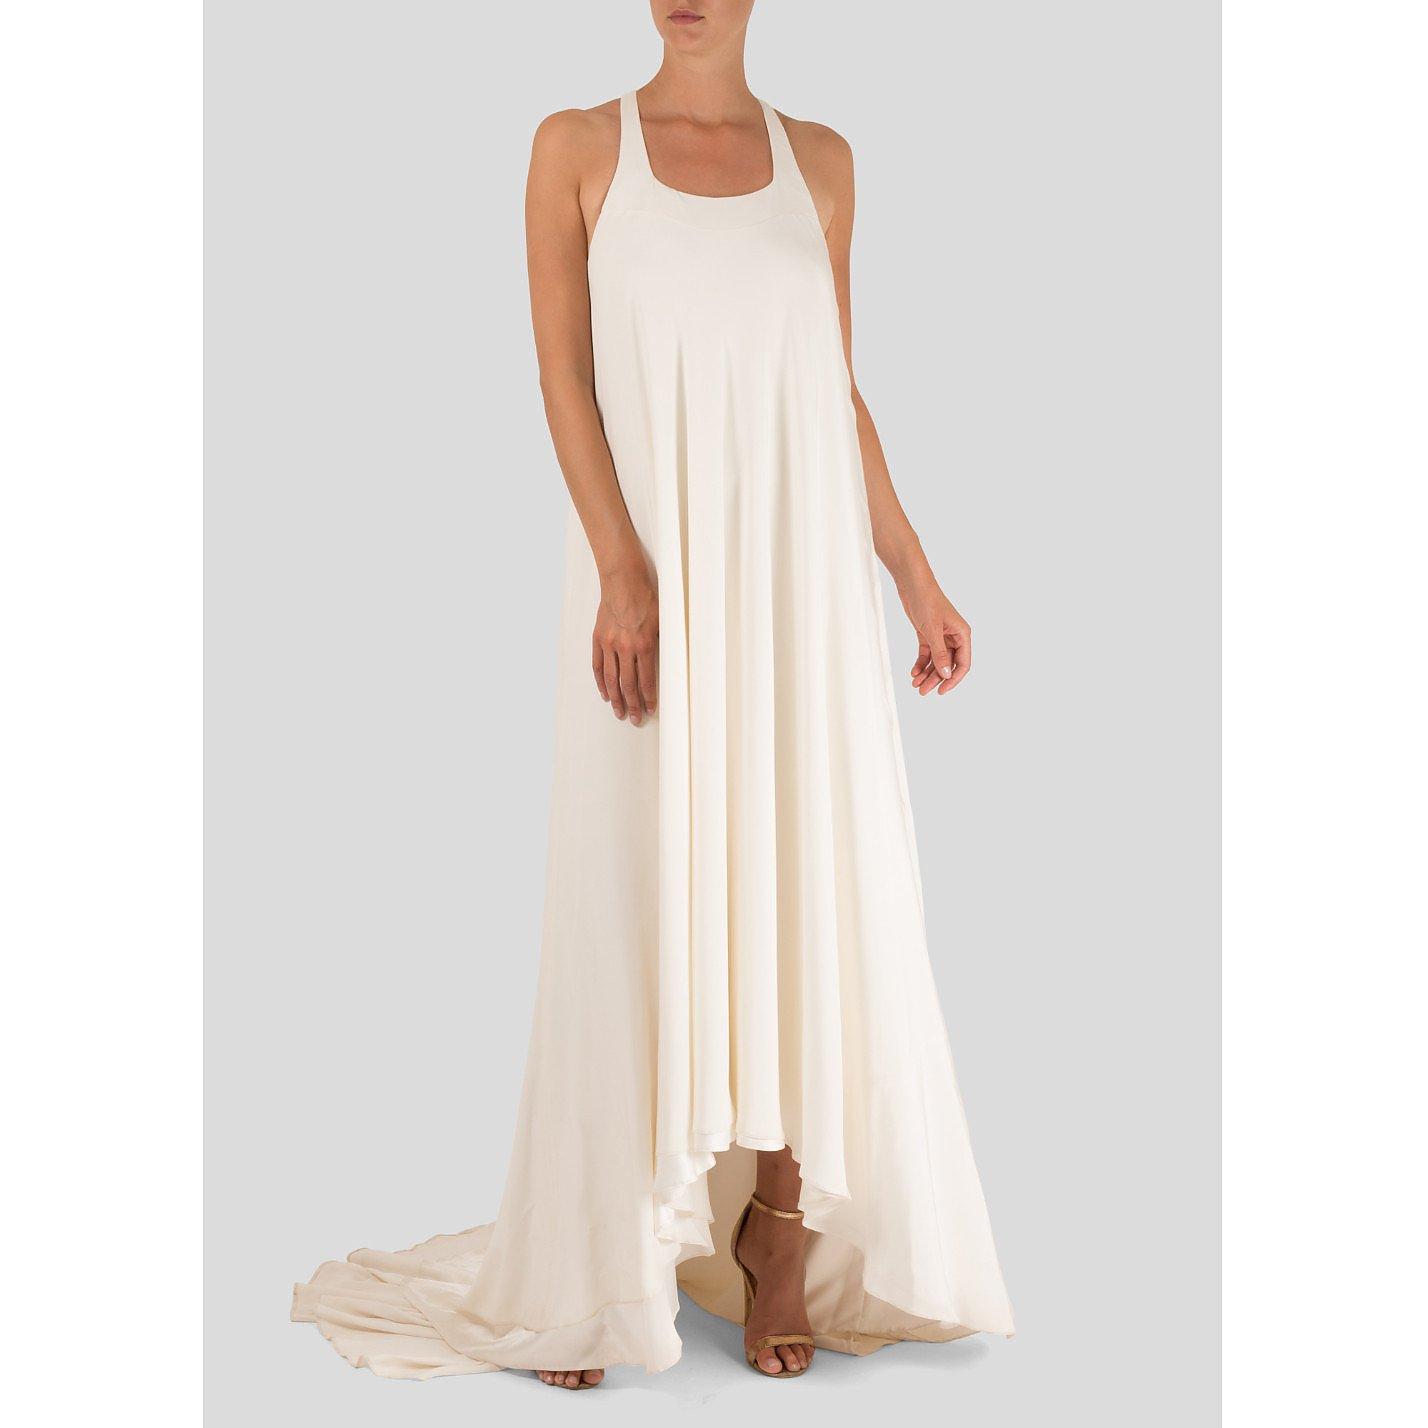 Charlie Brear Sabra Dress